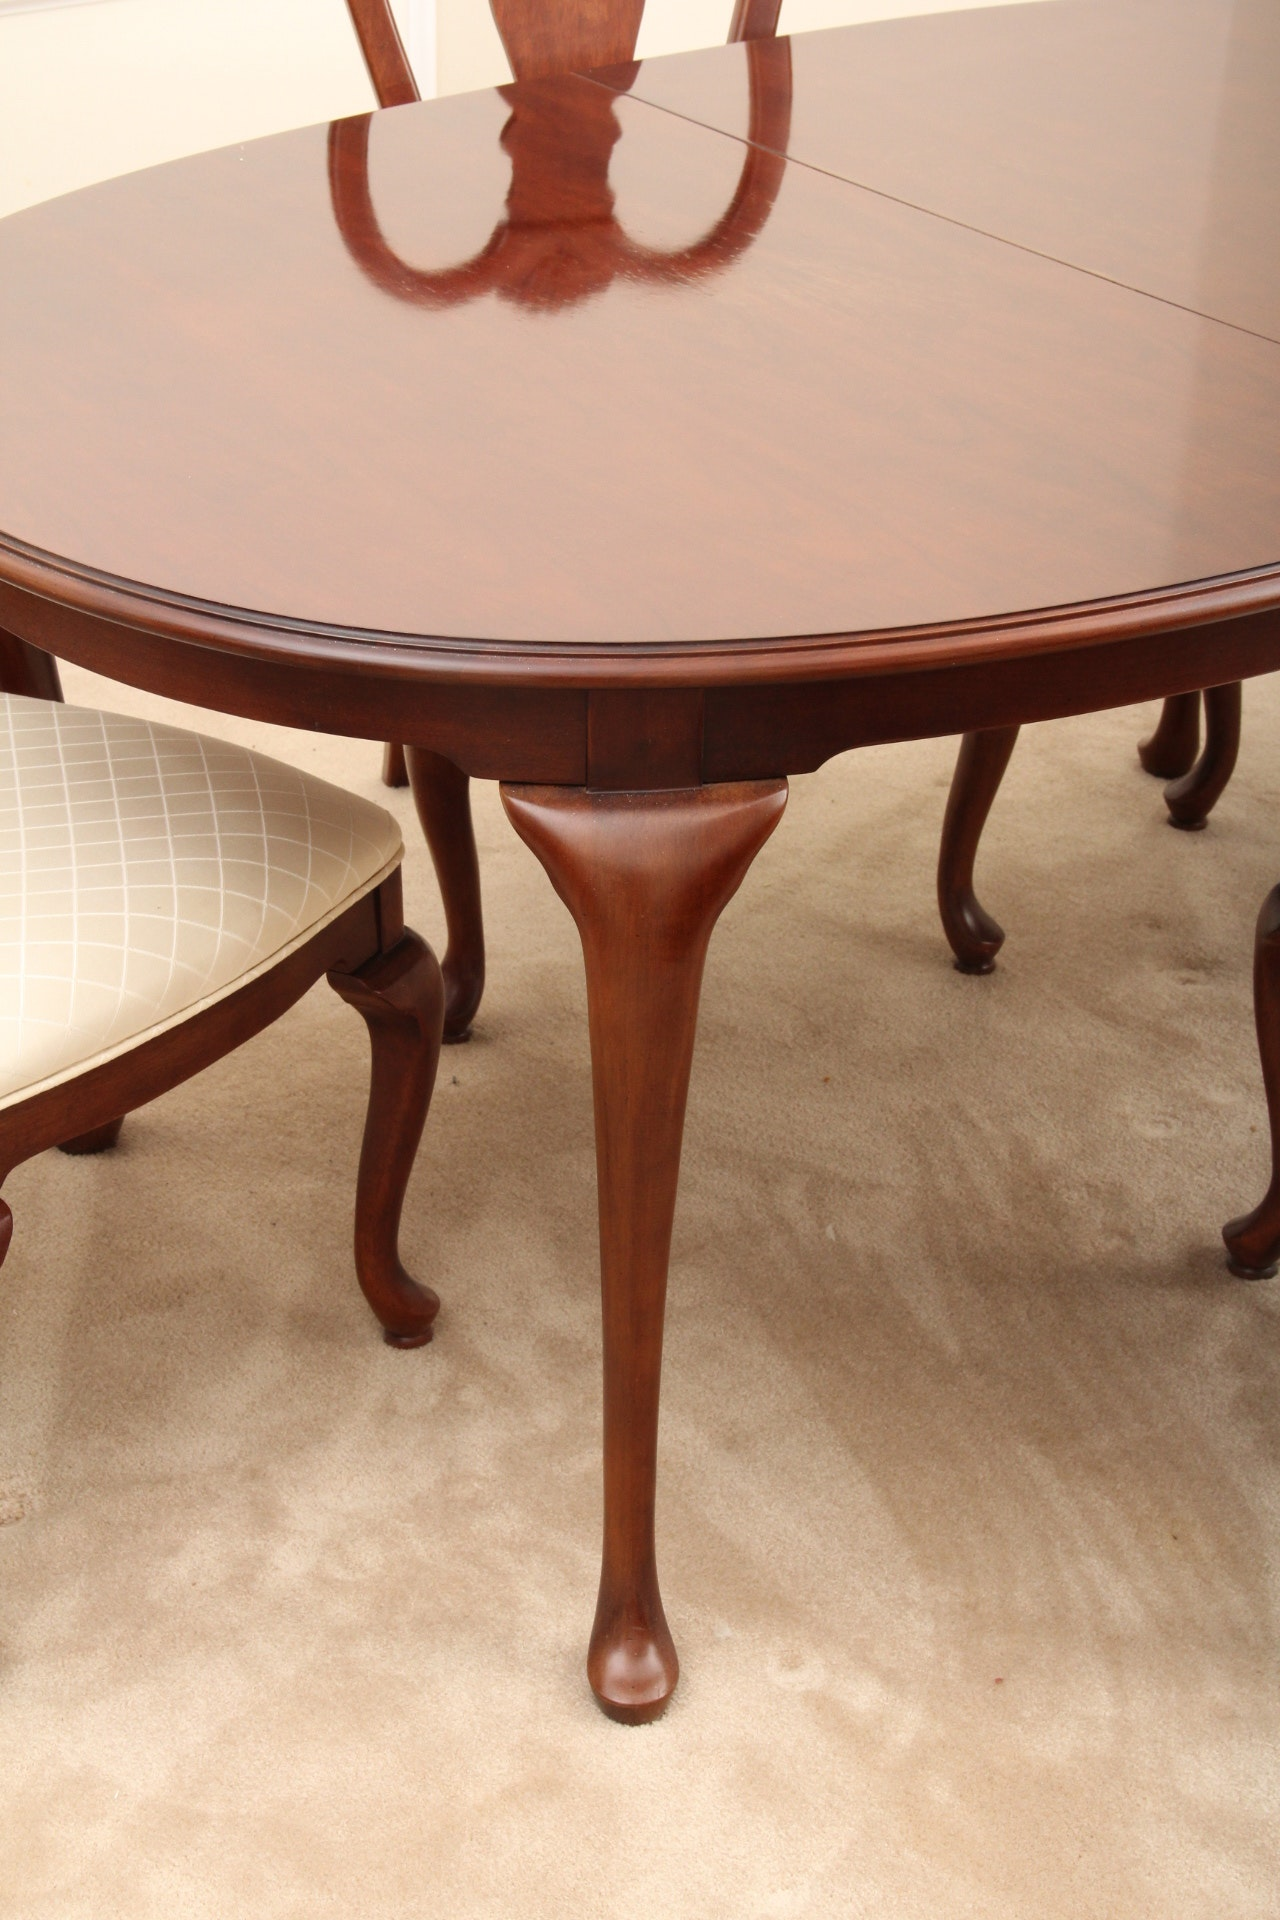 Elegant Bernhardt Dining Room Table and Chairs EBTH : IMG7997jpgixlibrb 11 from www.ebth.com size 587 x 880 jpeg 81kB